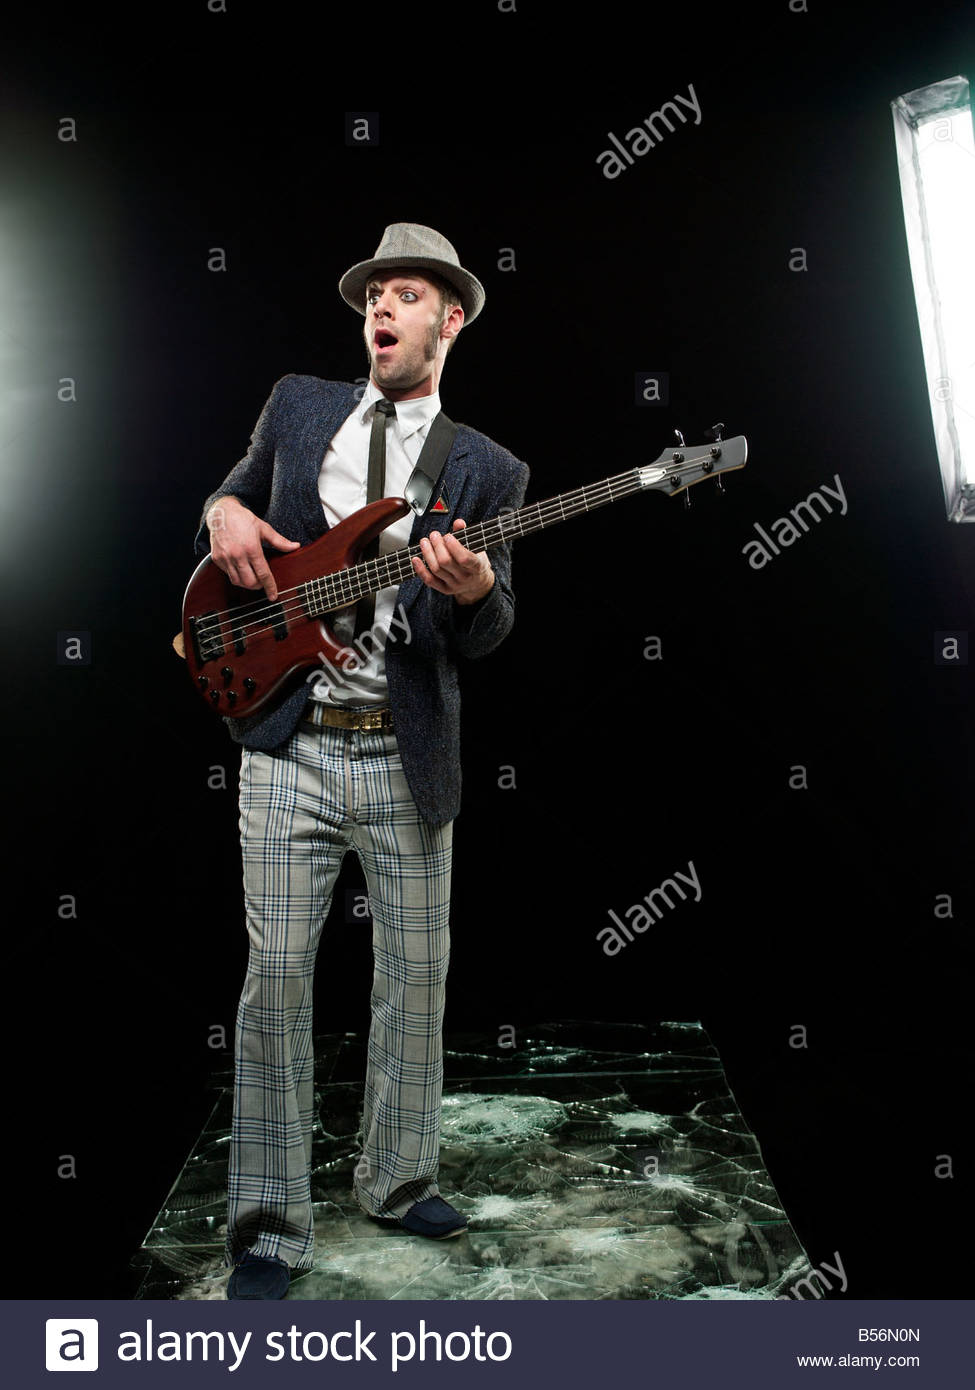 A guitarist playing a guitar - Stock Image